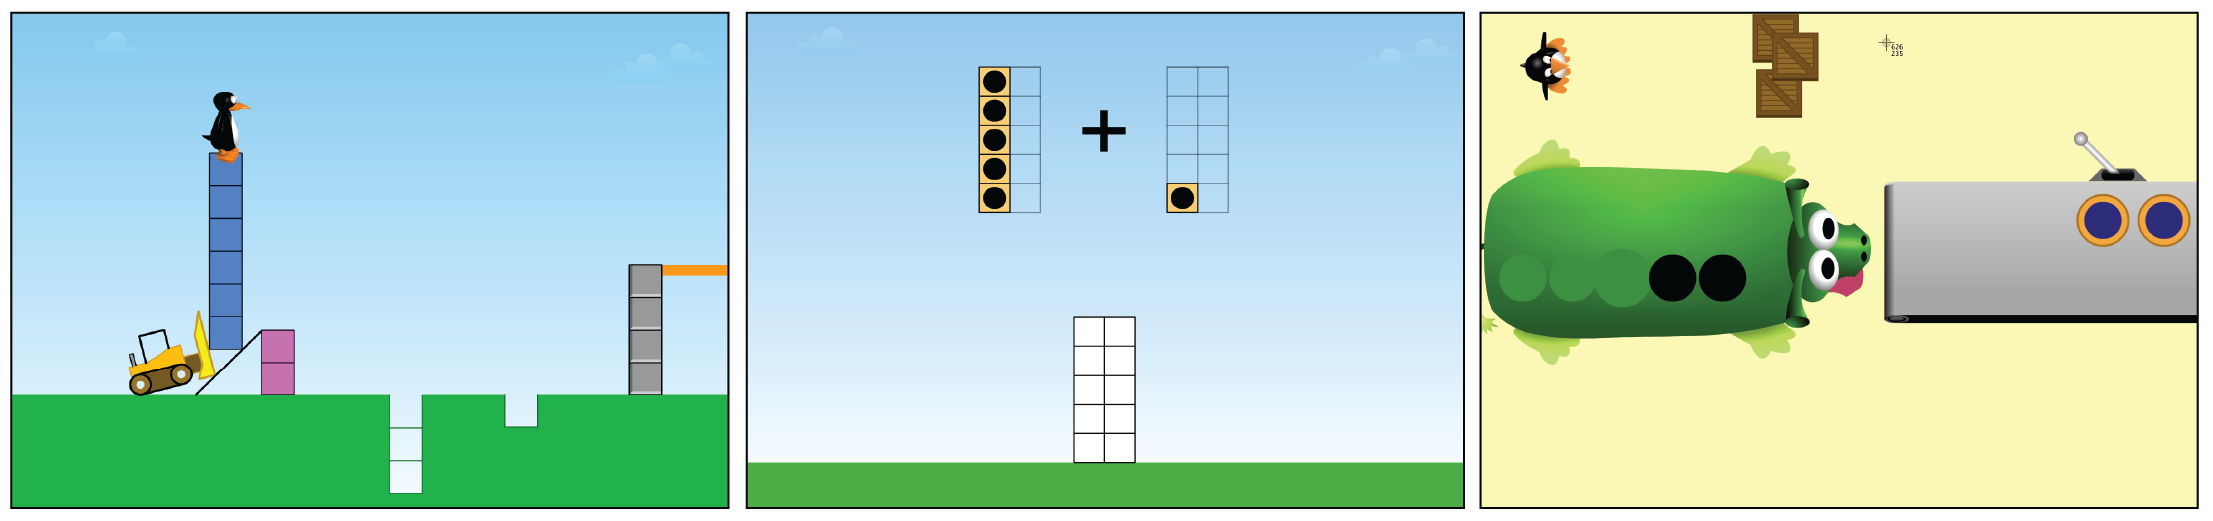 add-subtract-module